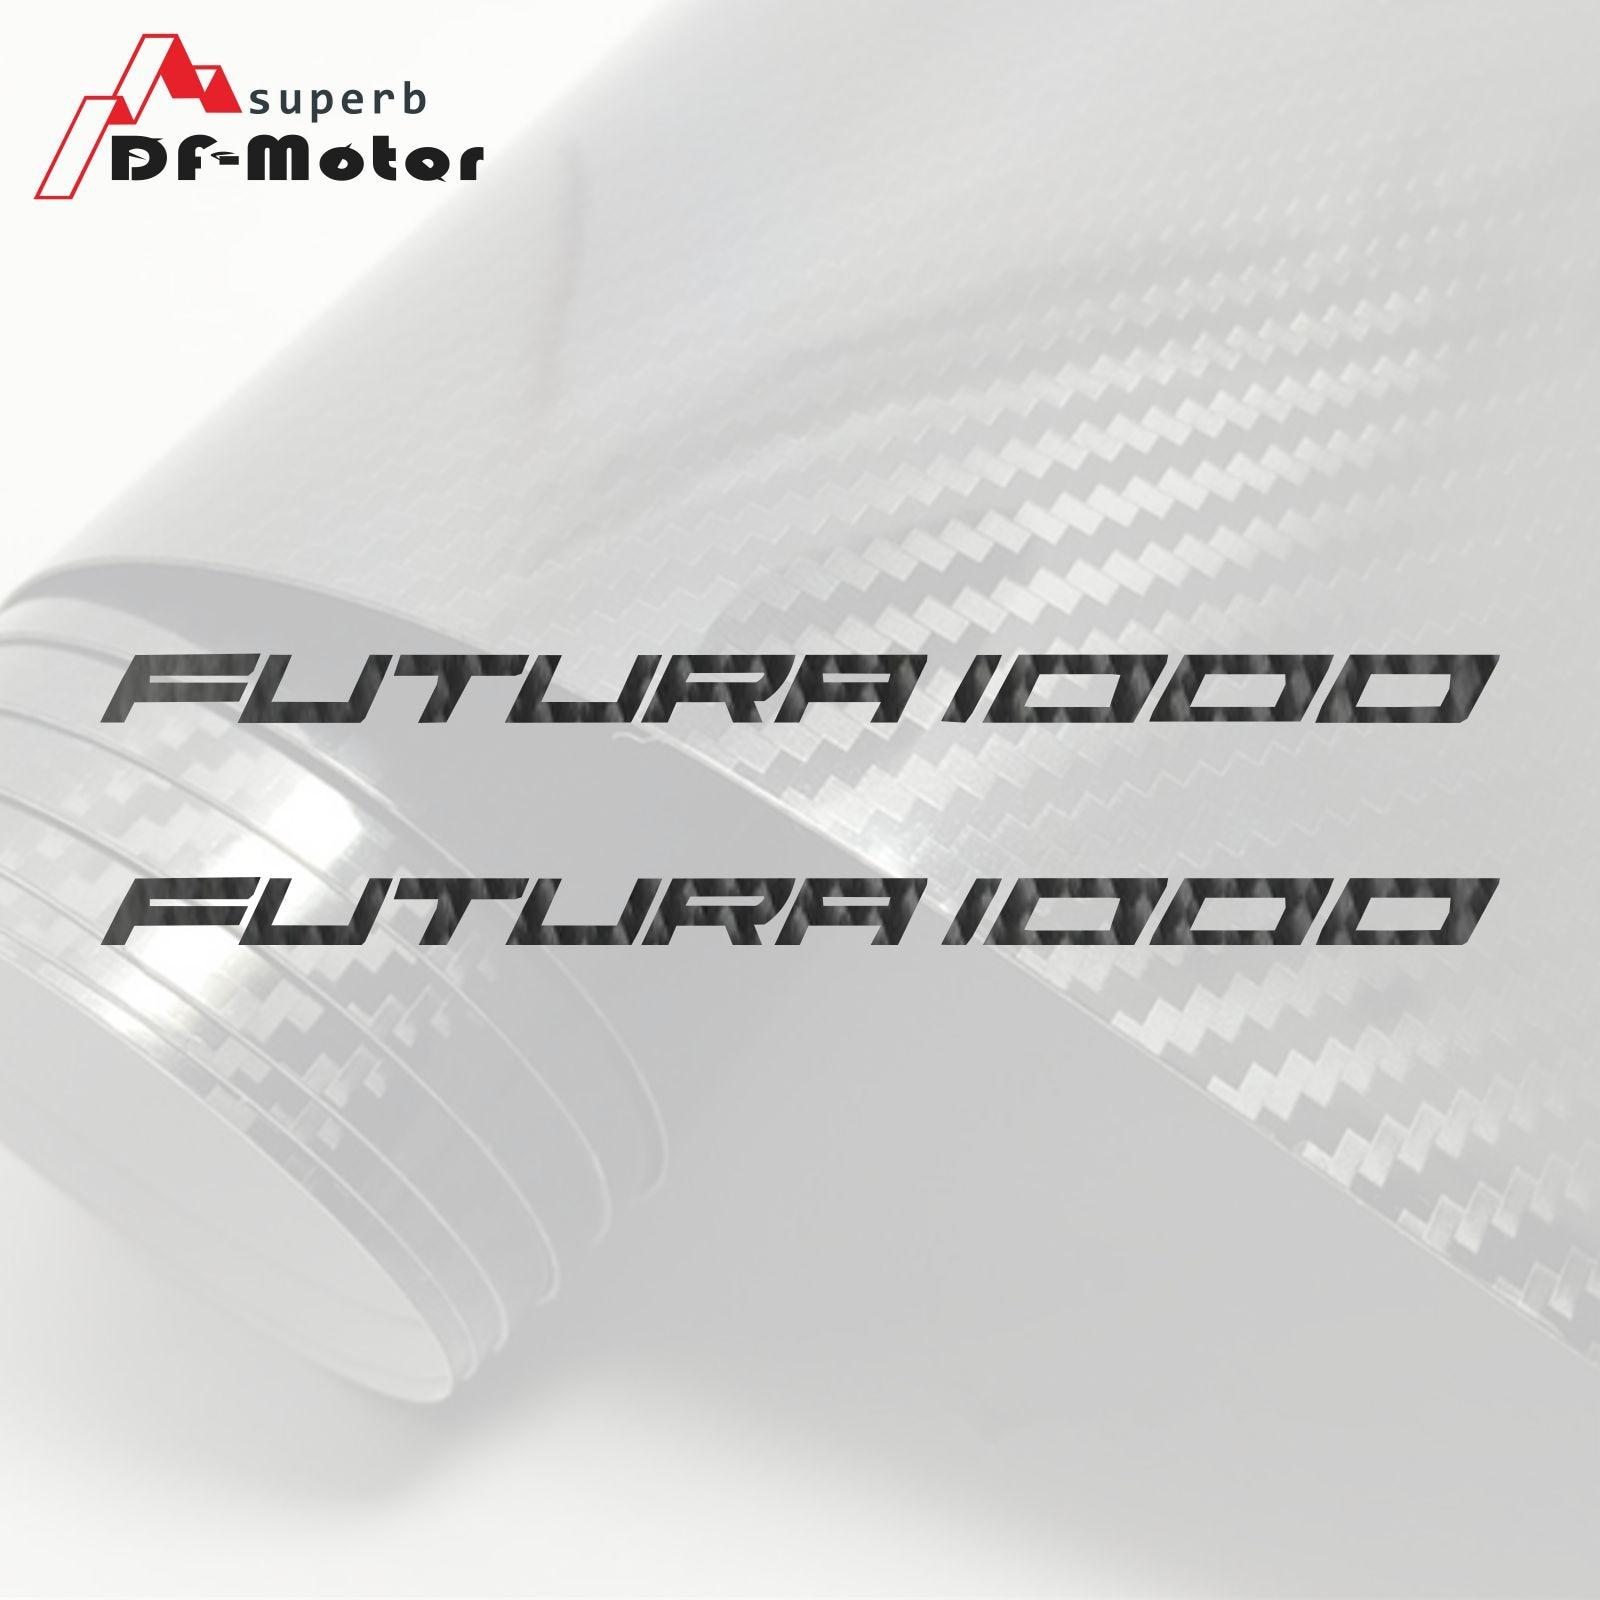 8Inch 5D Carbon Fiber Sticker Decal Motorcycle Car Sticker Wheels Fairing Helmet Sticker DIY For APRILIA RST 1000 Futura